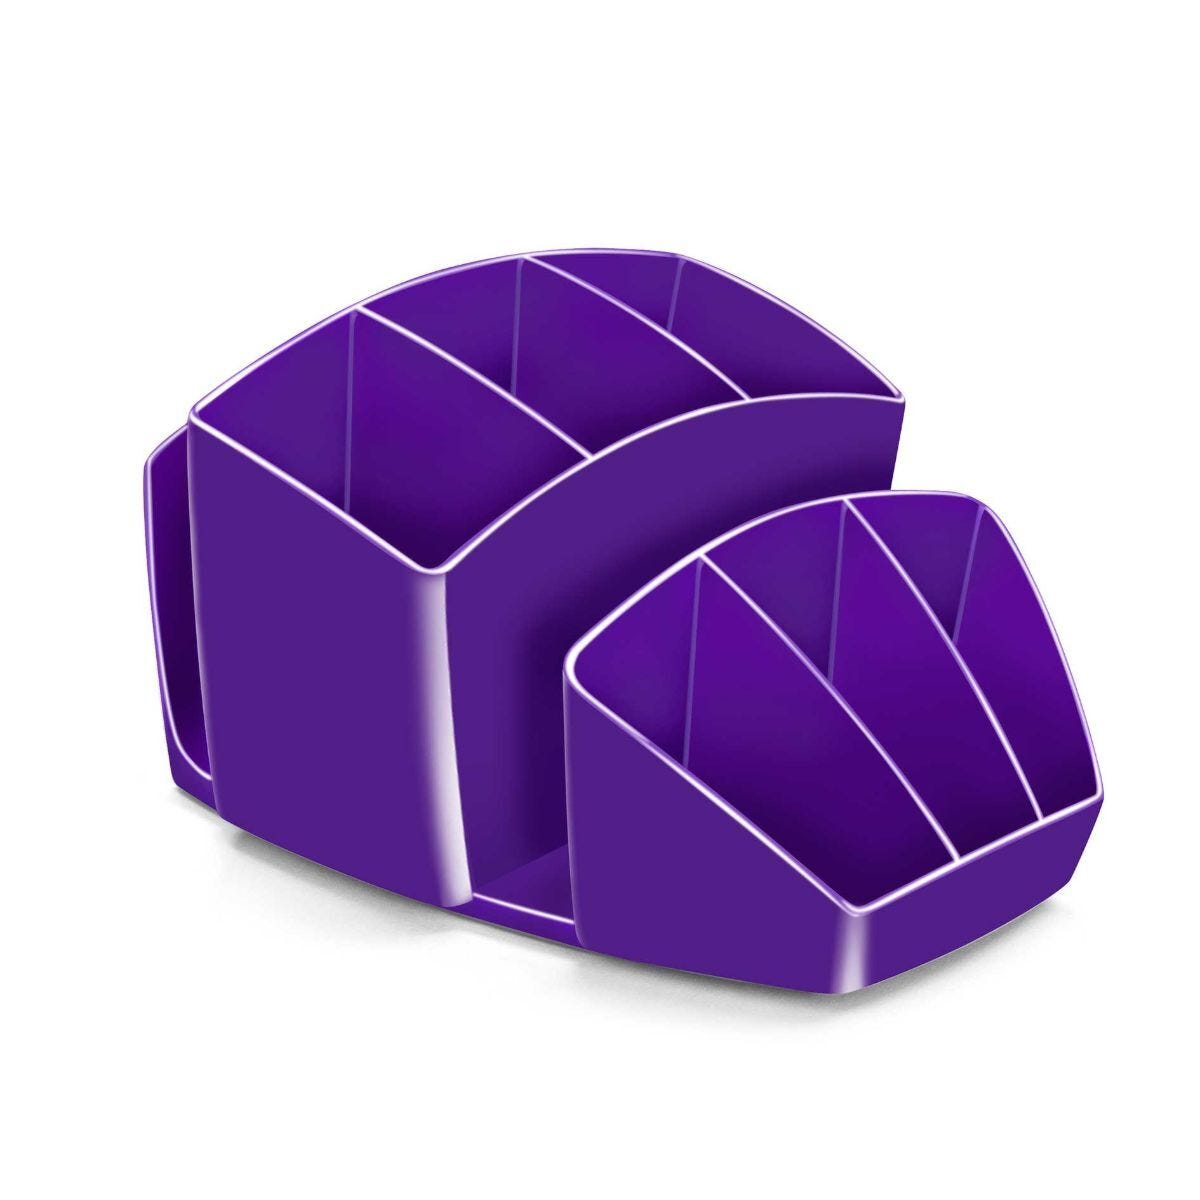 CEP Gloss Desktop Organizer with 8 Compartments Purple